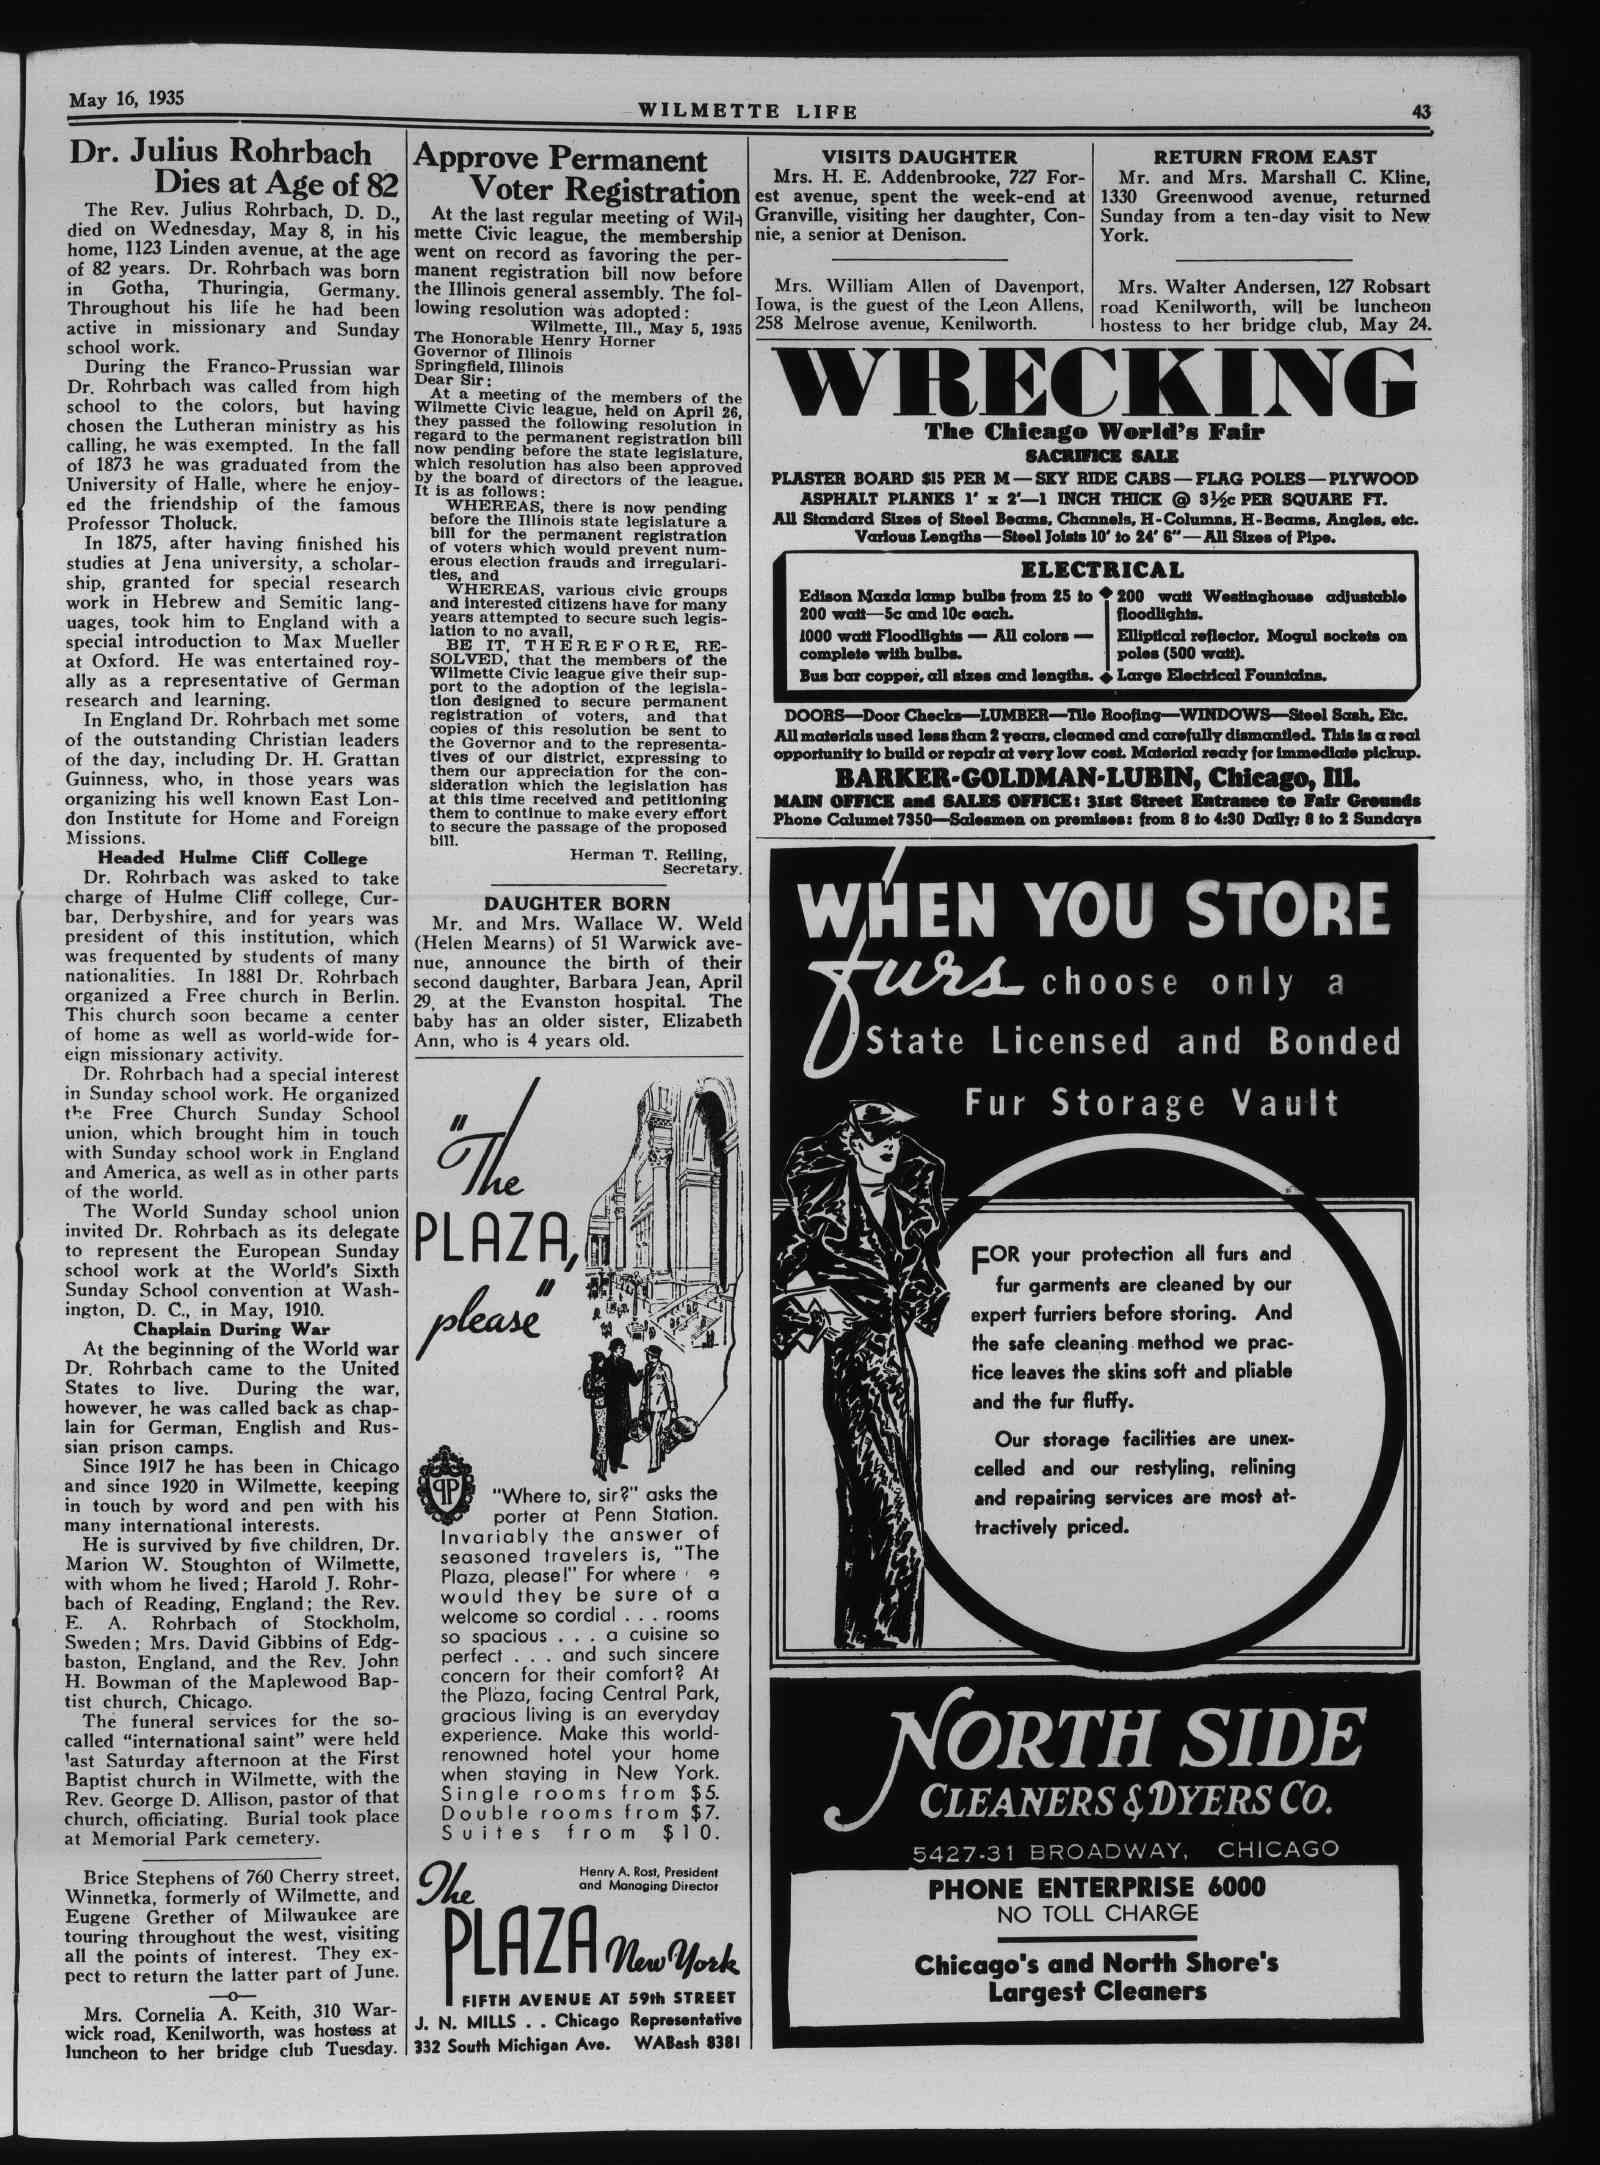 Wilmette Life (Wilmette, Illinois), 16 May 1935